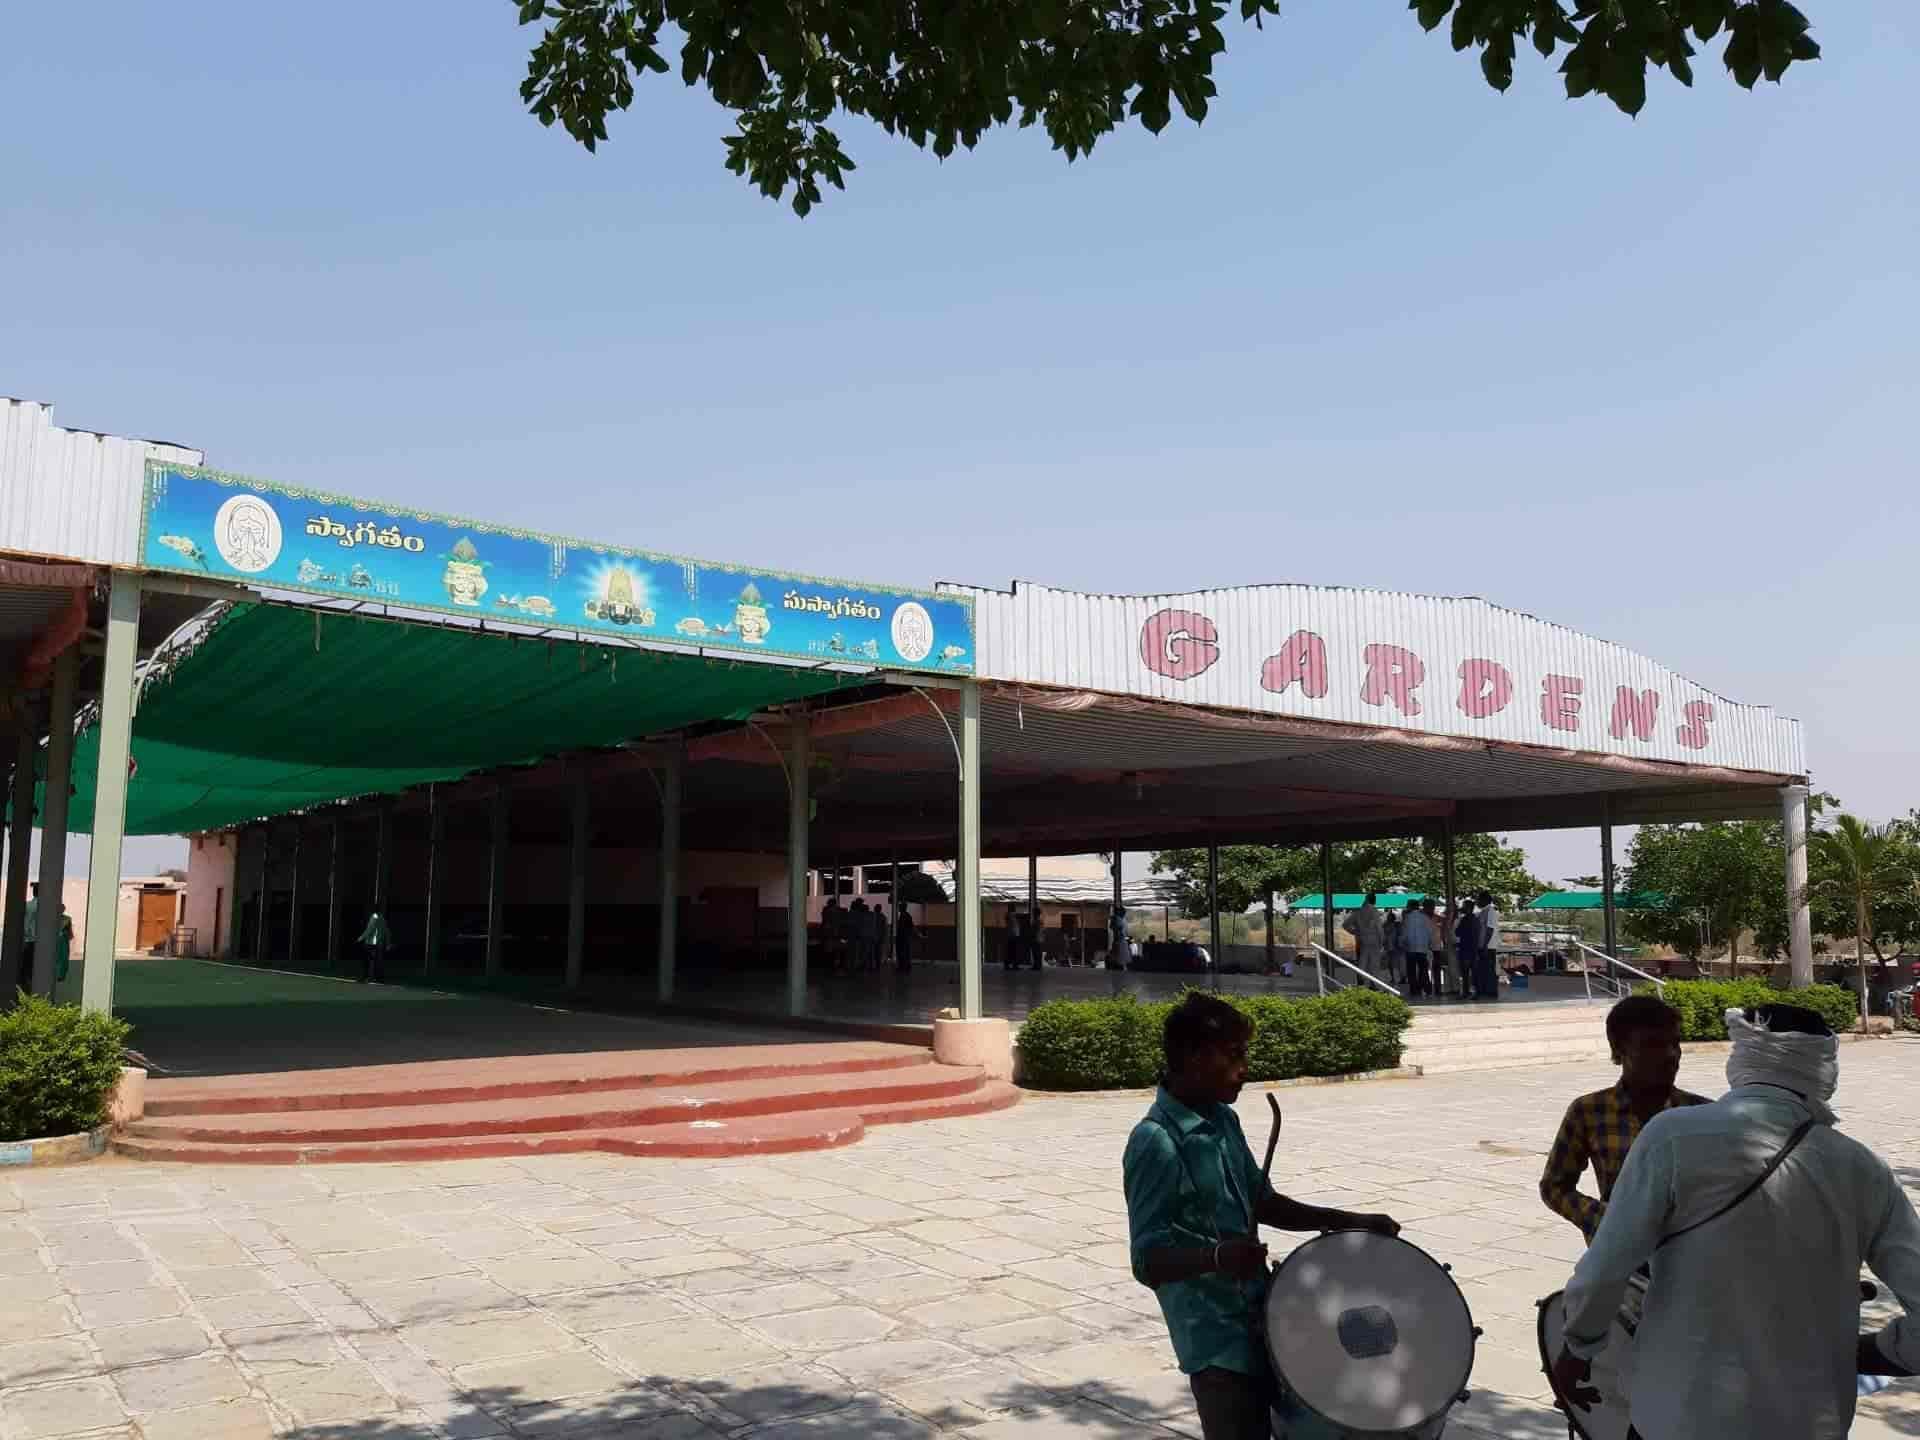 Balaji Garden Cci Road Banquet Halls In Adilabad Justdial